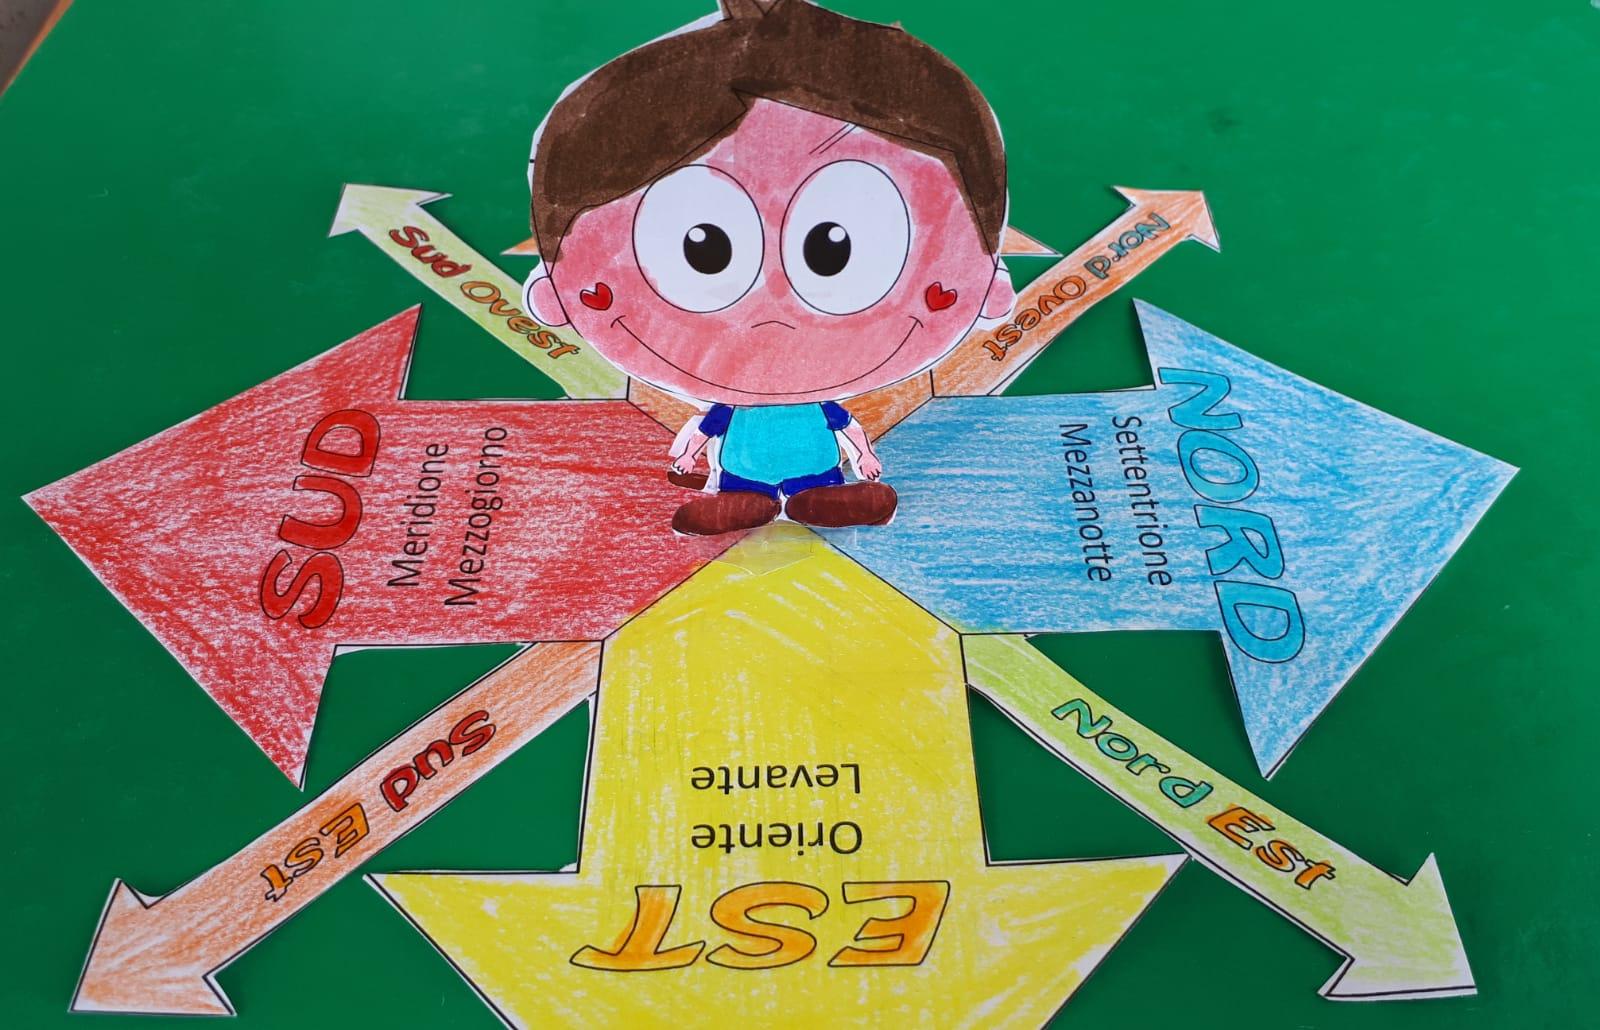 playandlearn-ideedimari-orienteering-gioco-bambini-creatività-scuola